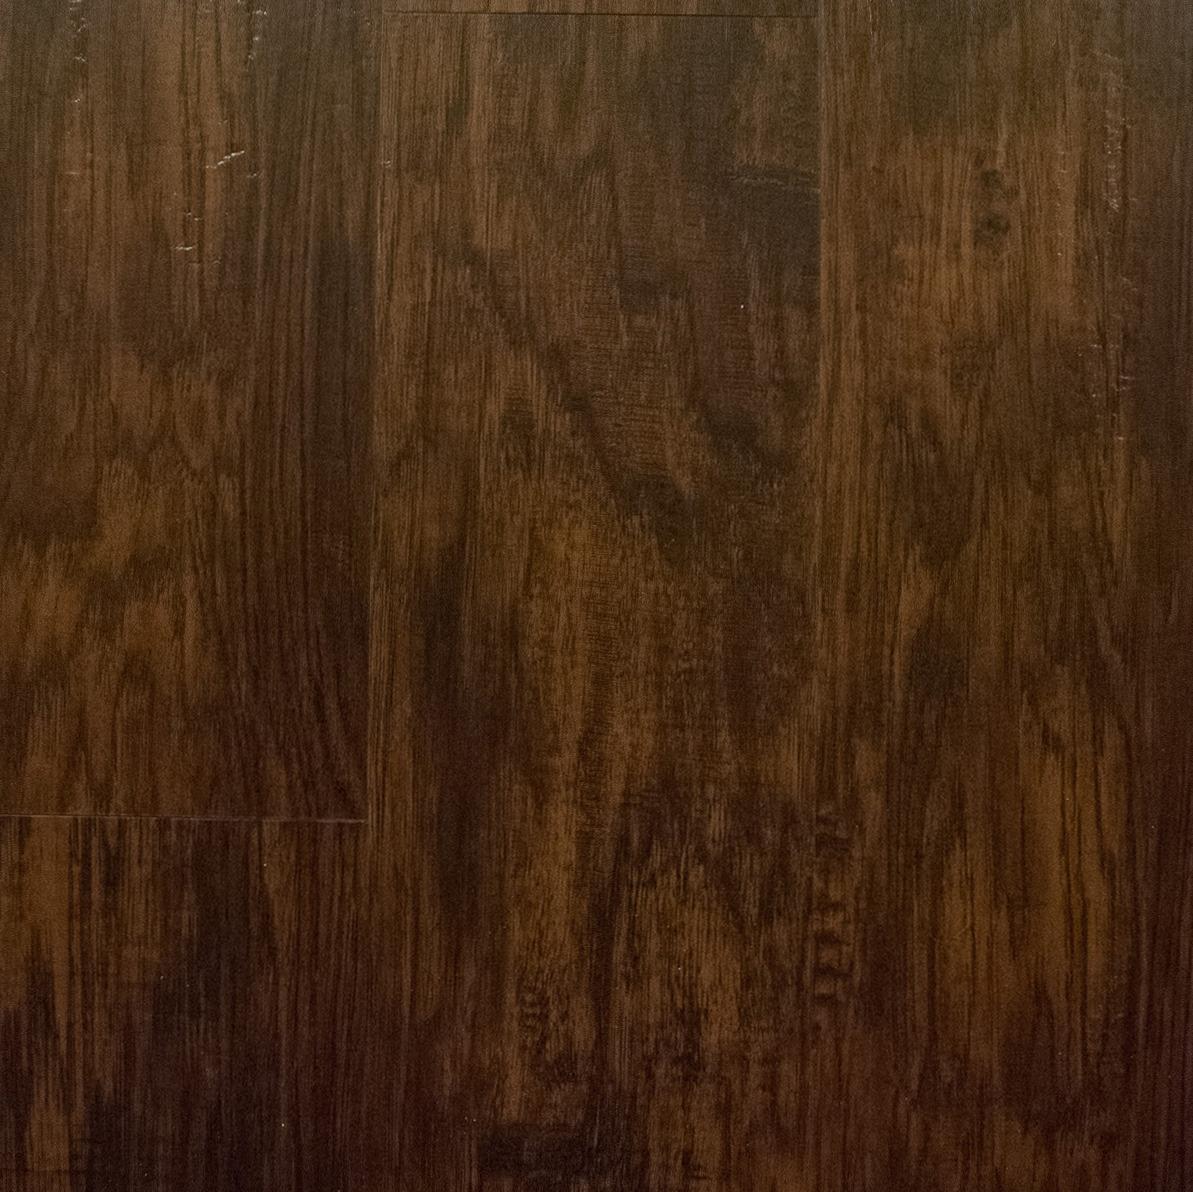 48 x 6 shaw rosso classico floorte lvp schillings for Floorte flooring